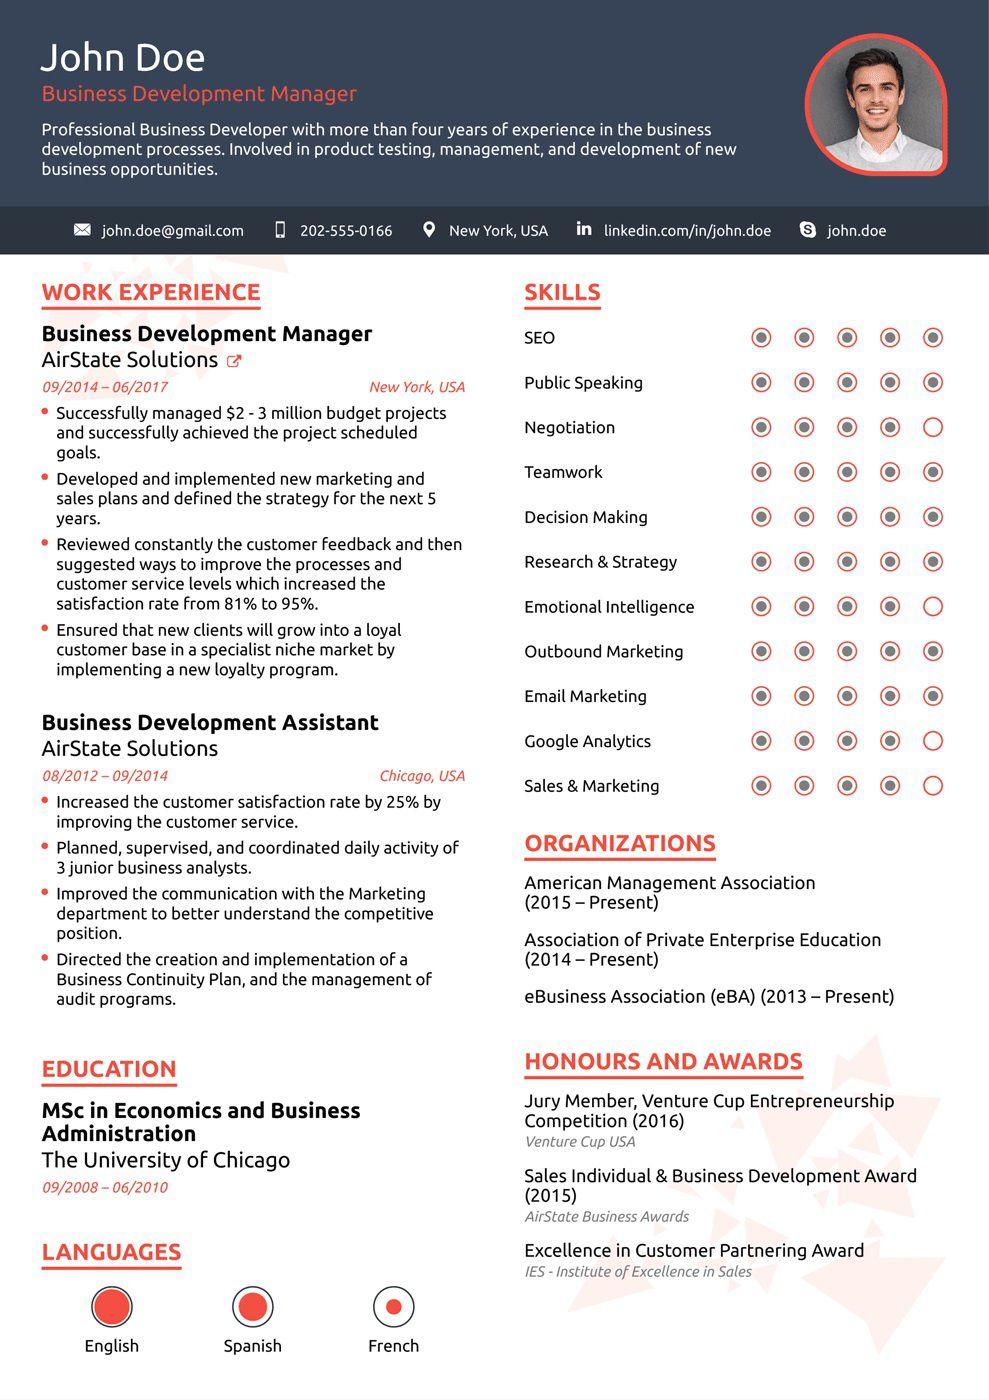 004 Beautiful Best Professional Resume Template Inspiration  Reddit 2020 DownloadFull